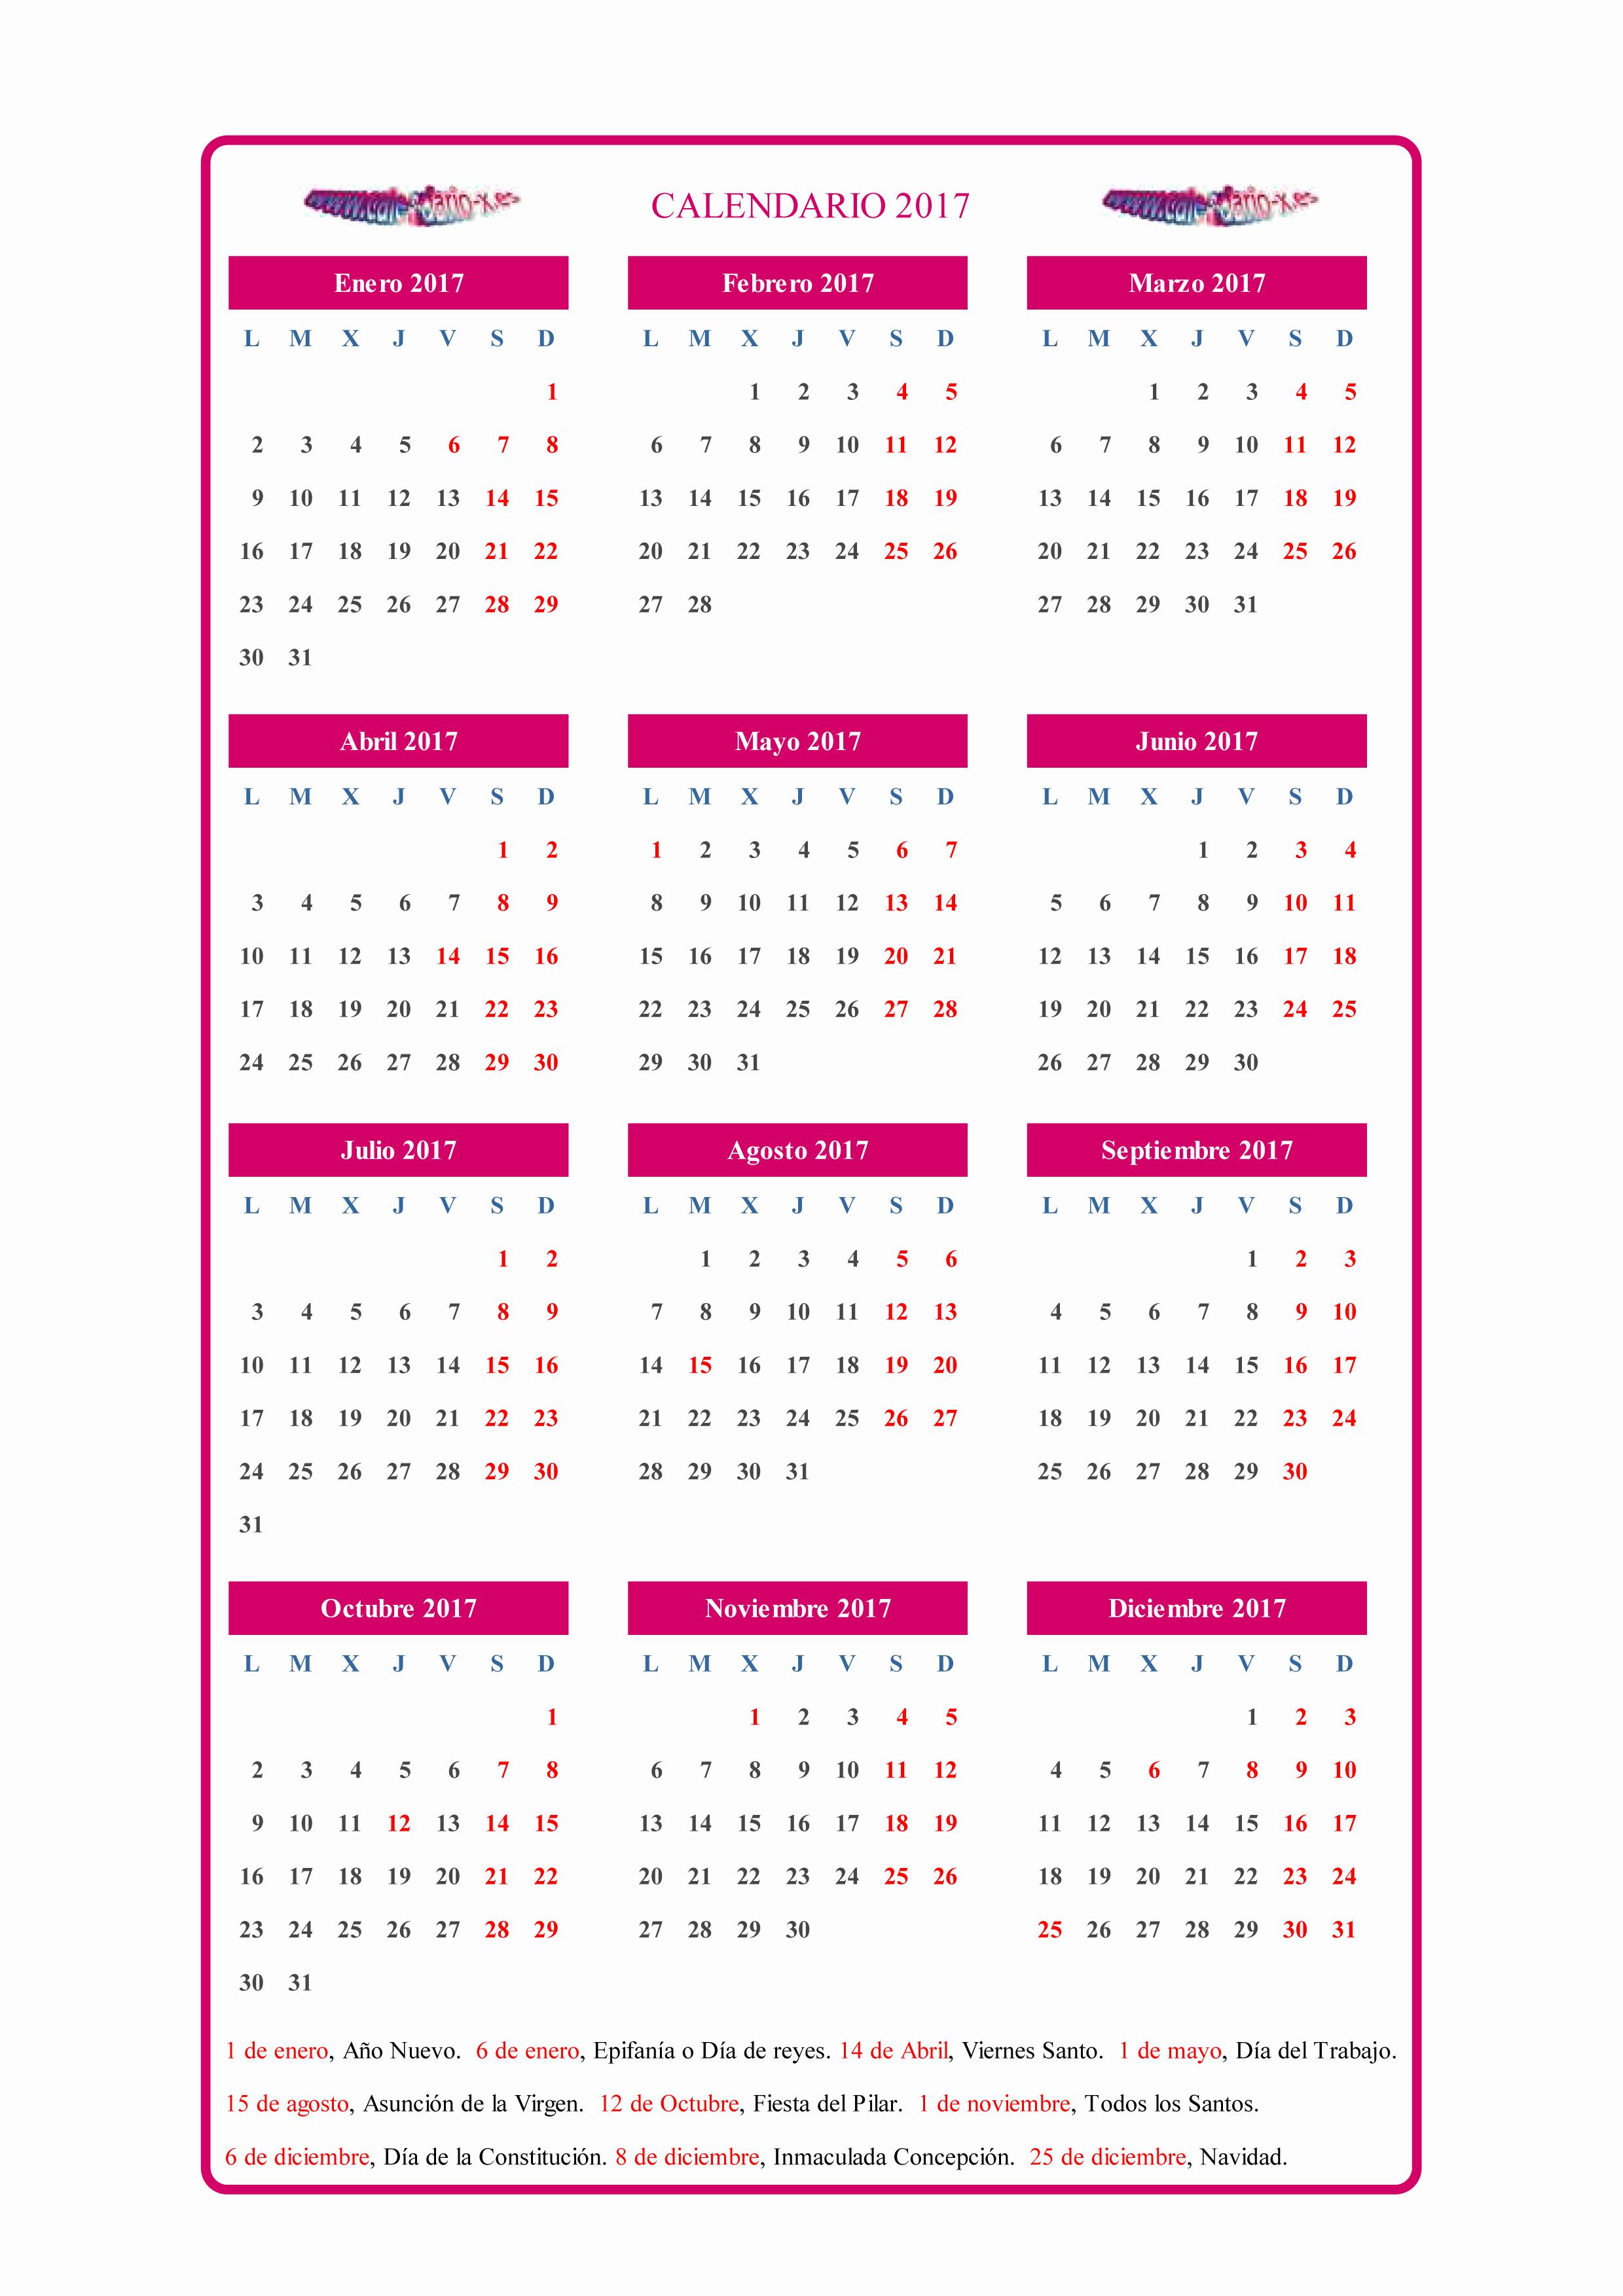 Calendario Anual 2017 Para Imprimir Fresh Map Calendario 2017 Para Imprimir